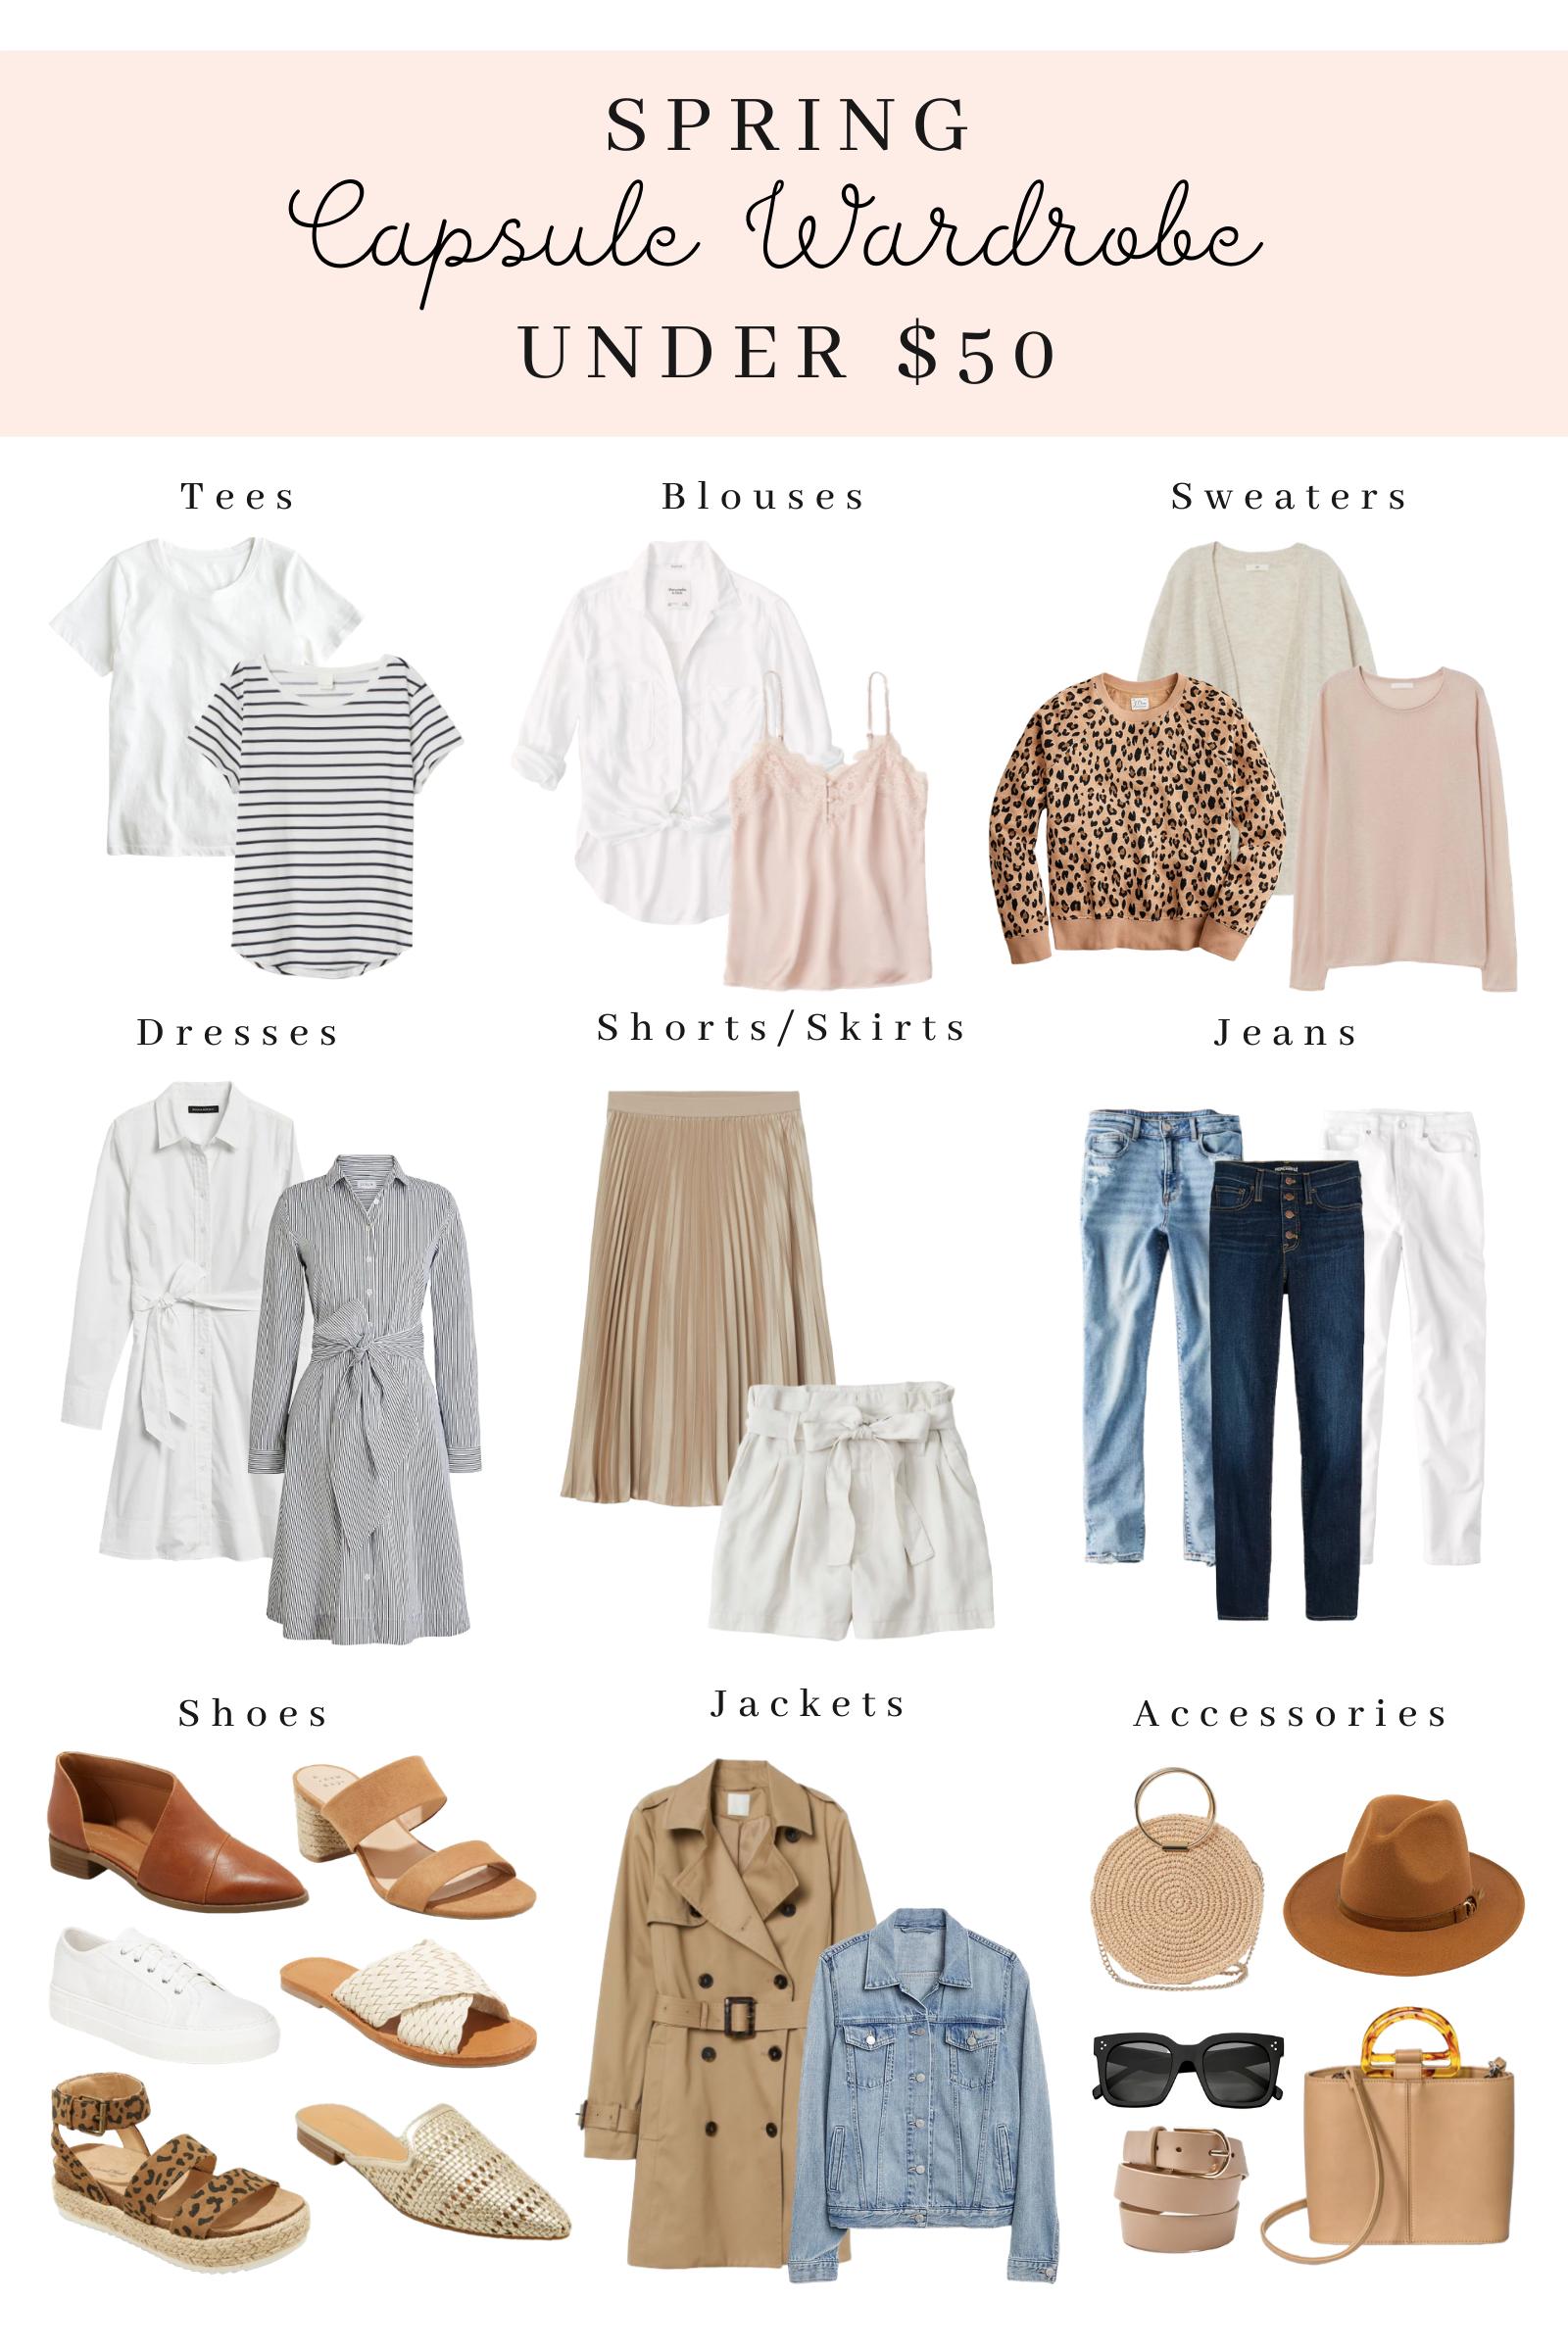 Spring Capsule Wardrobe Essentials Under $5 - Sequins and Sales